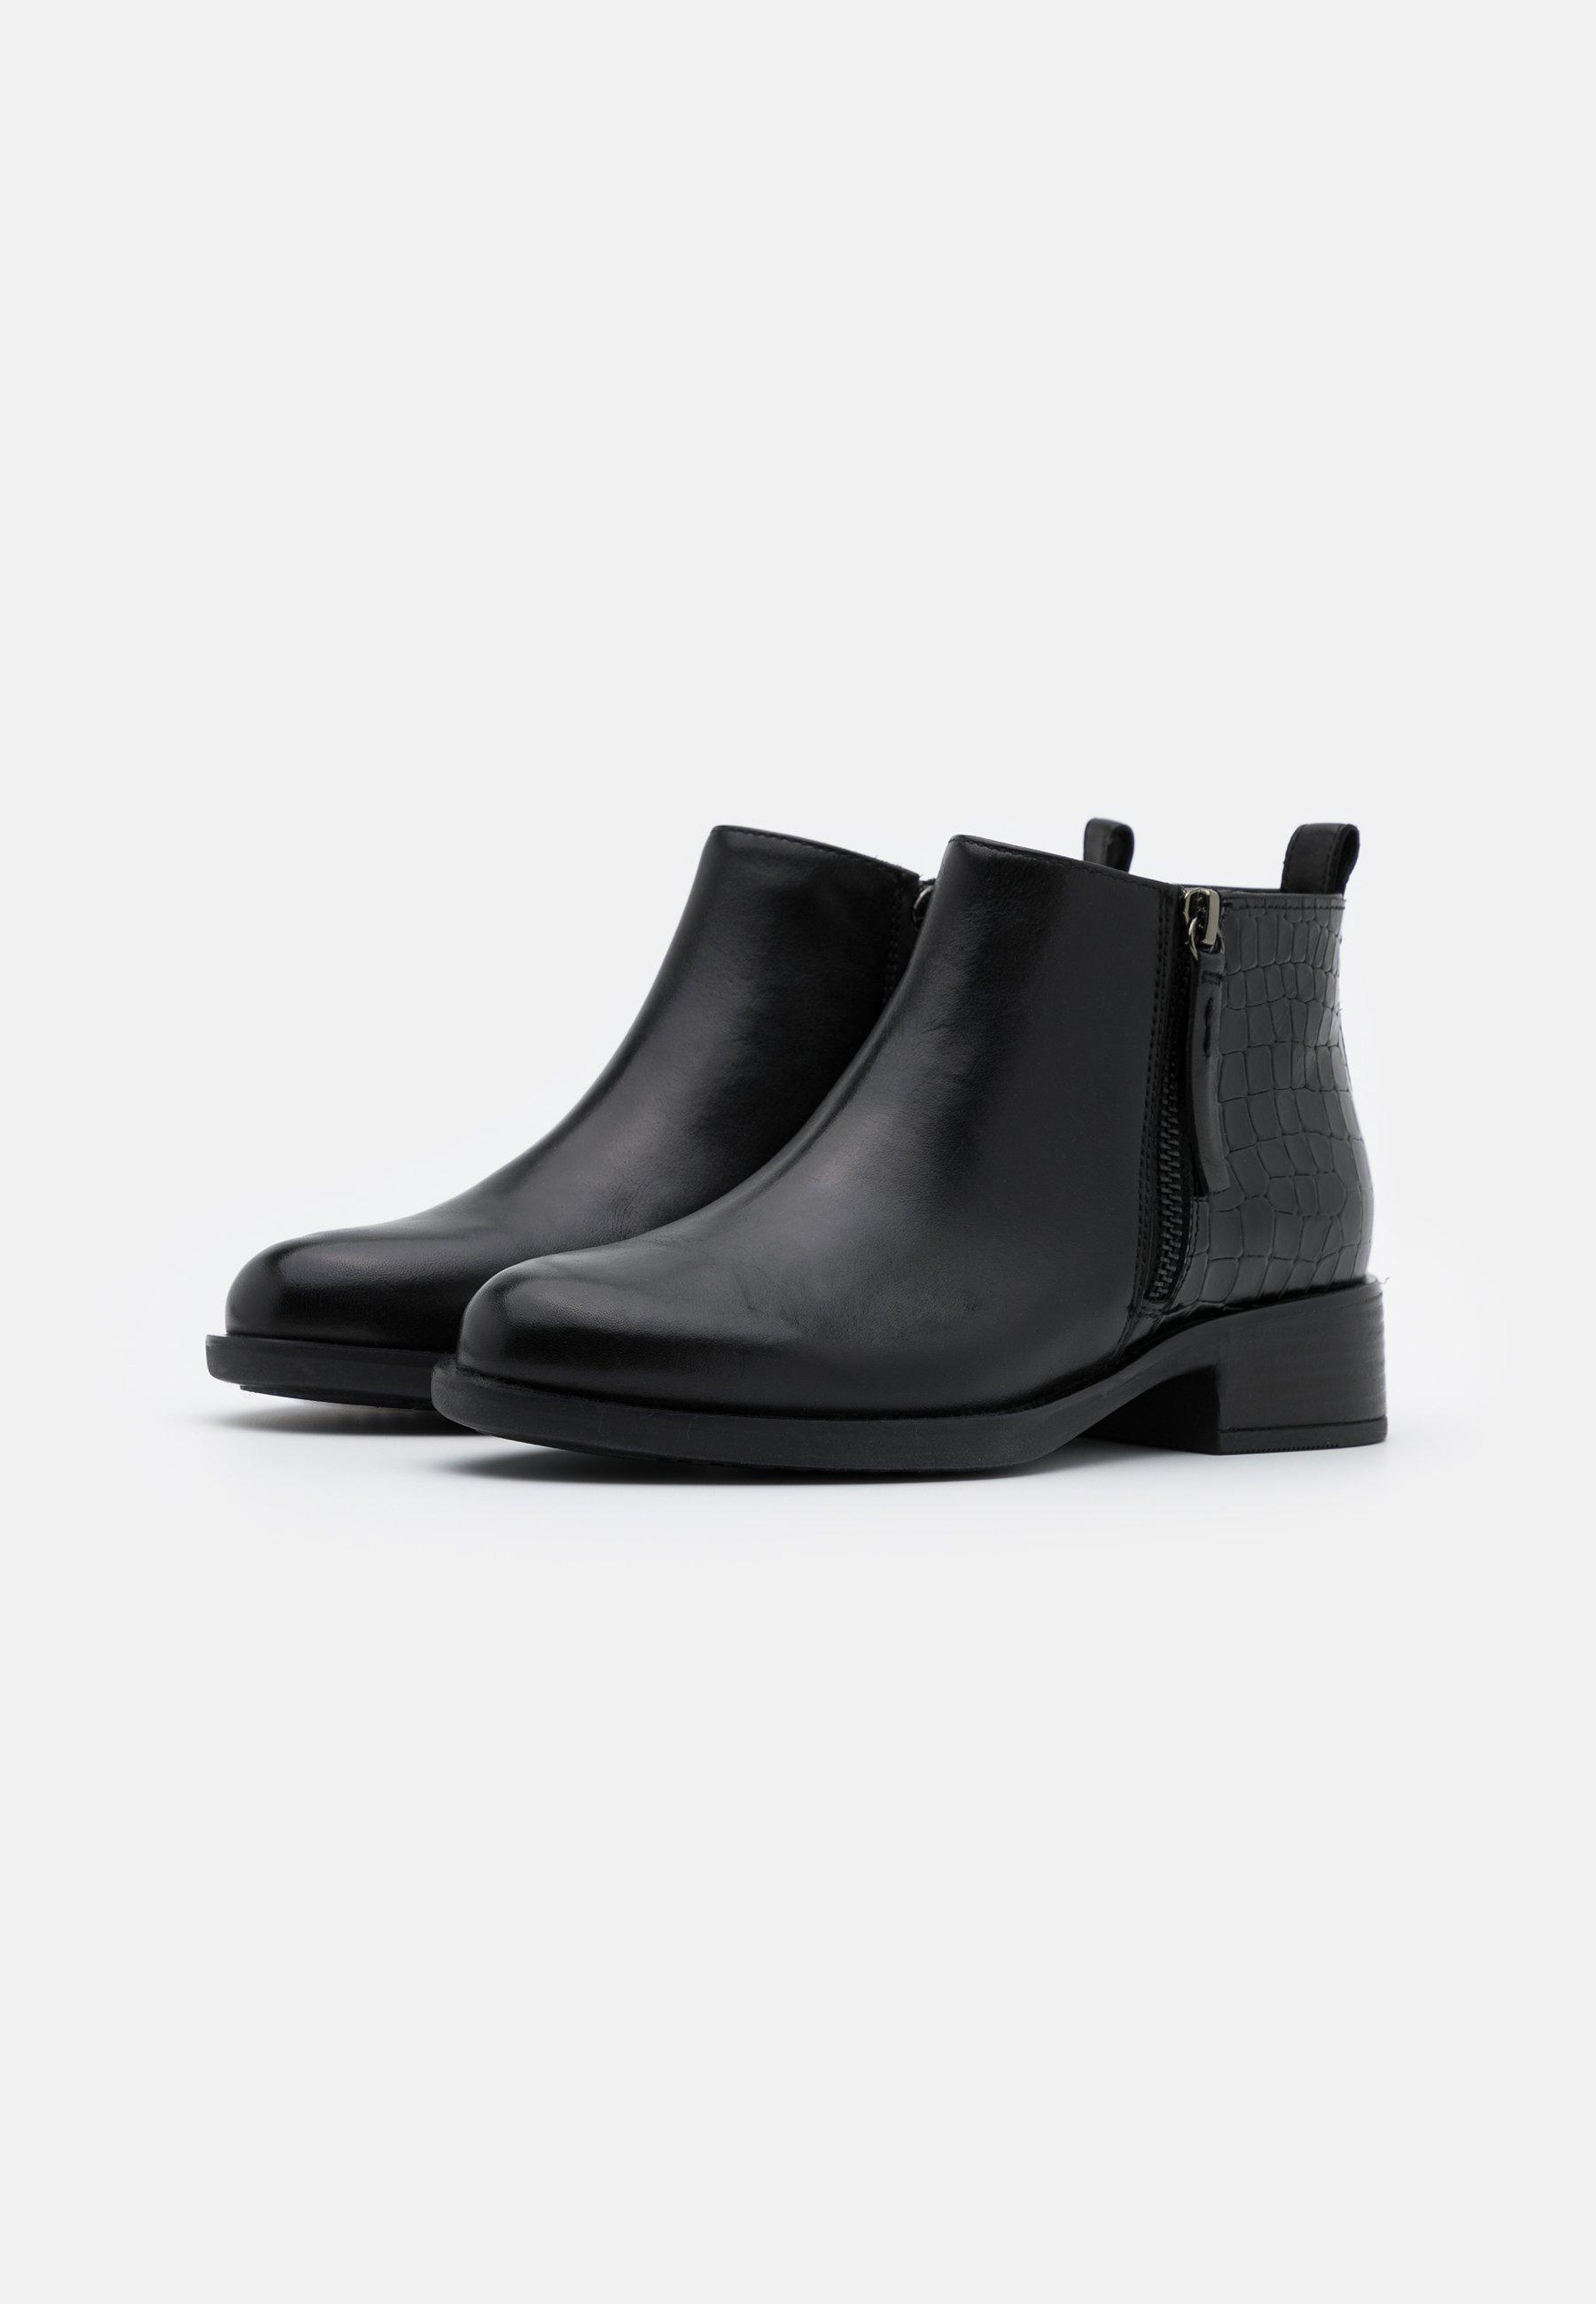 Geox RESIA Ankle Boot black/schwarz